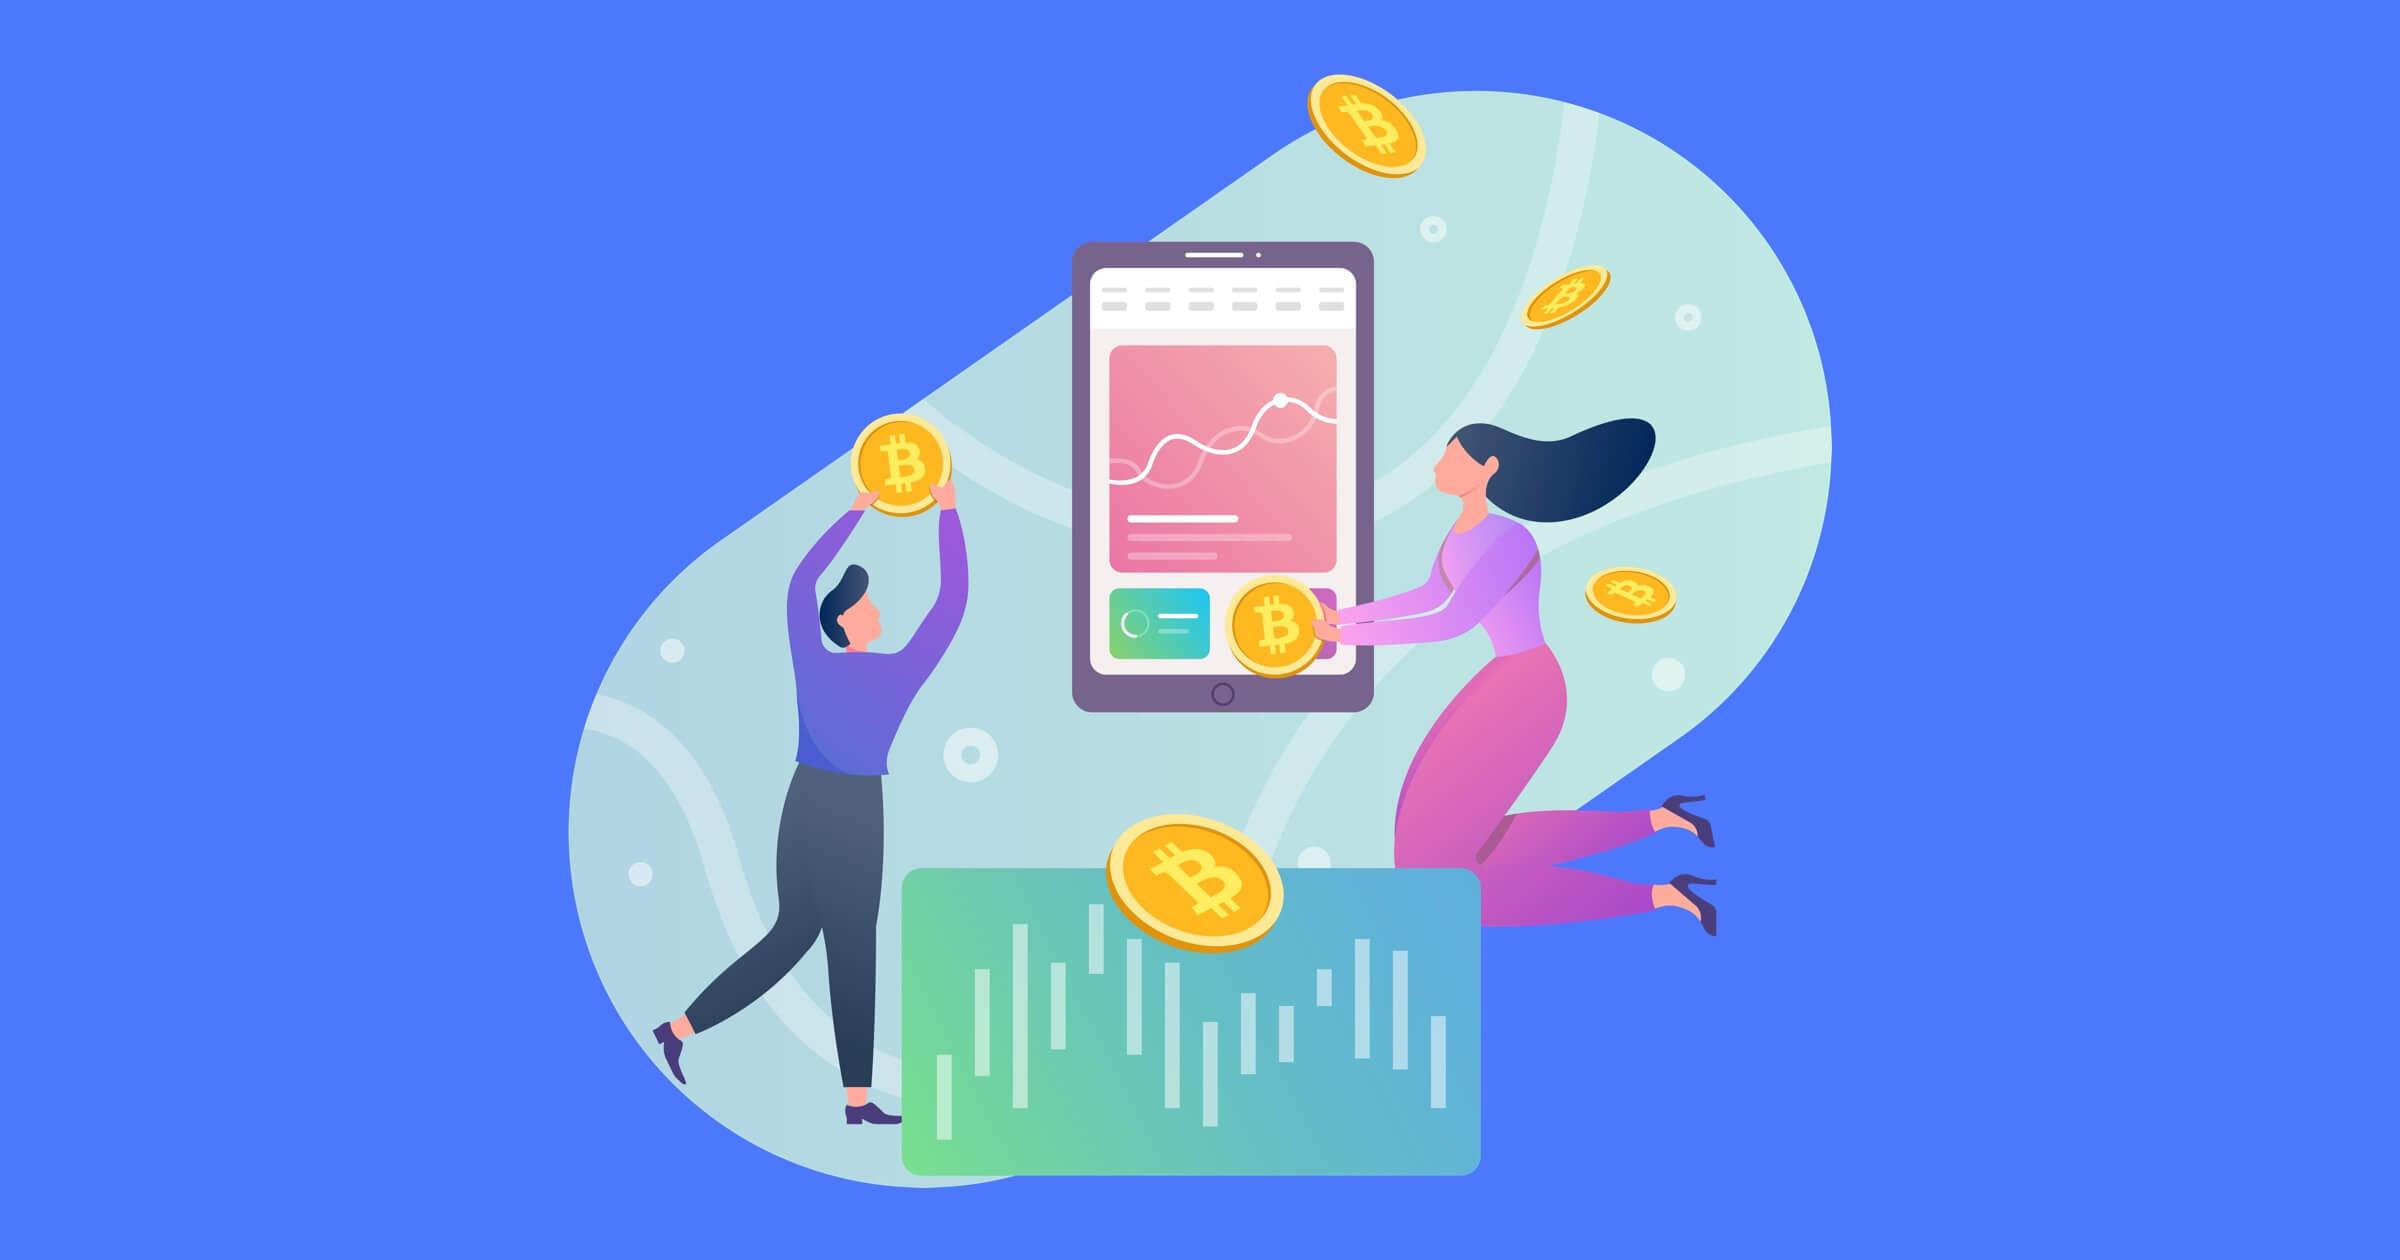 Volatilidade: a palavra chave para o sucesso no mercado das criptomoedas